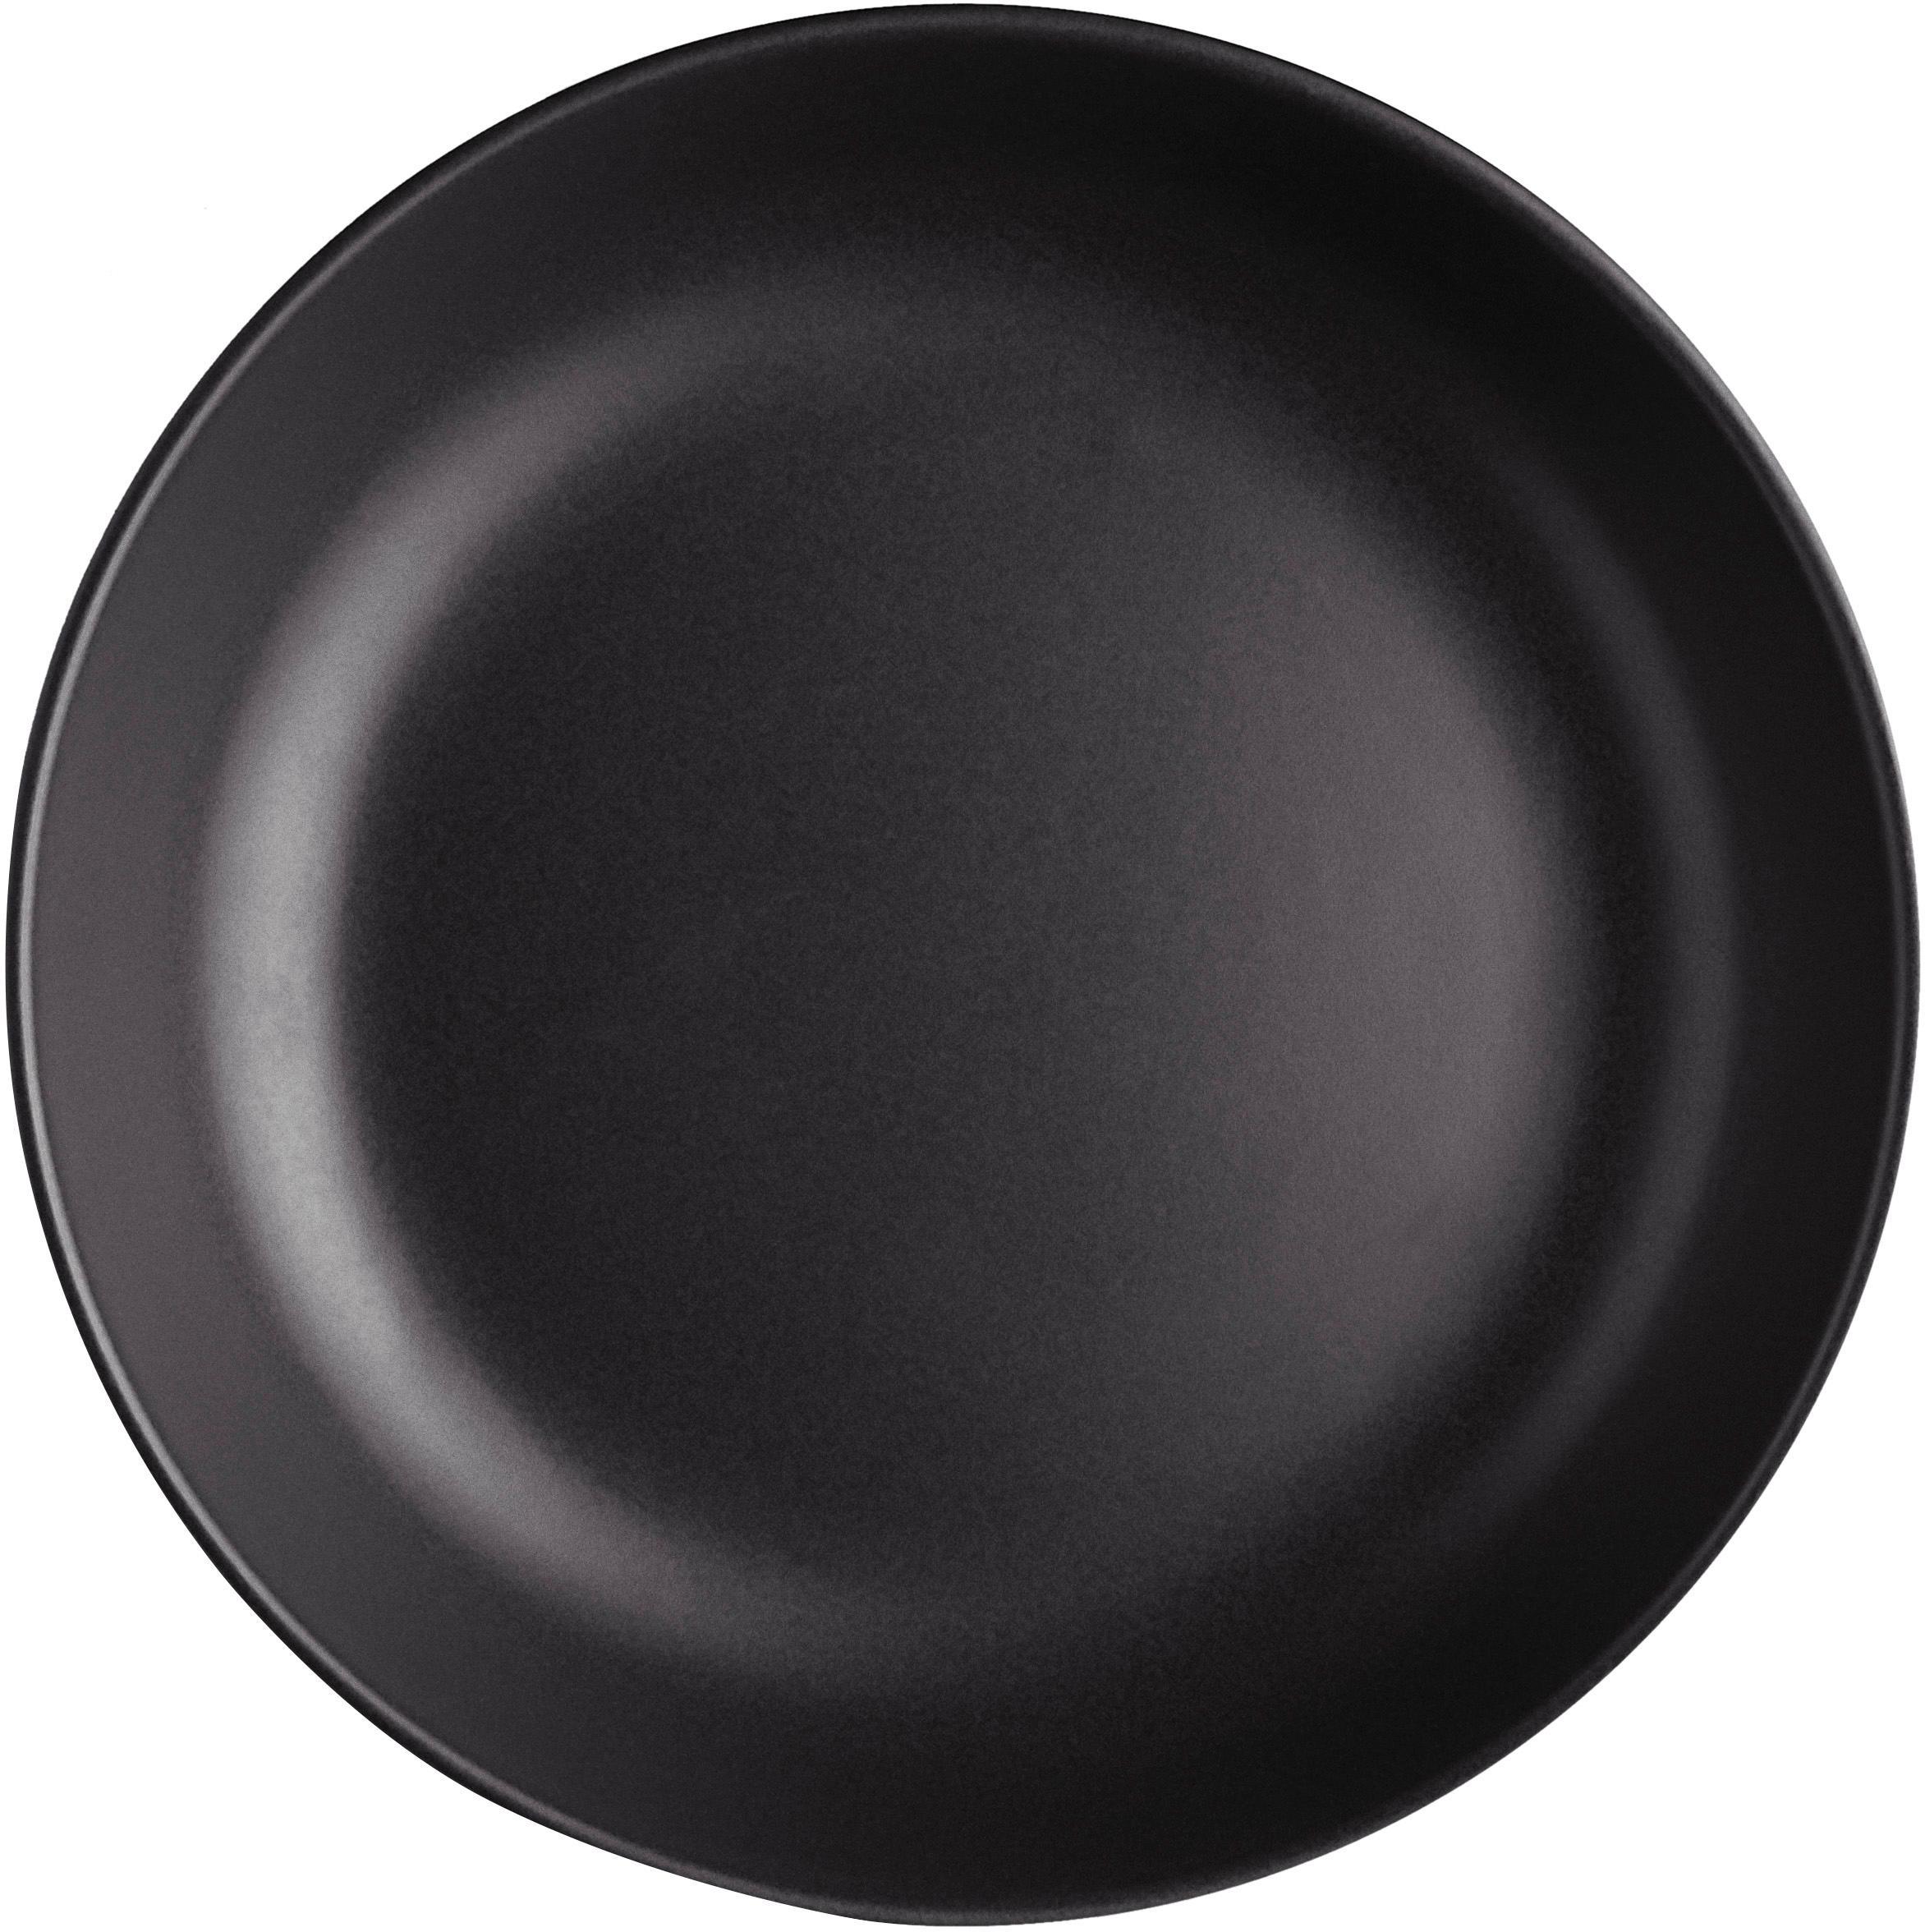 Piatto fondo nero opaco Nordic Kitchen 4 pz, Terracotta, Nero opaco, Ø 20 cm